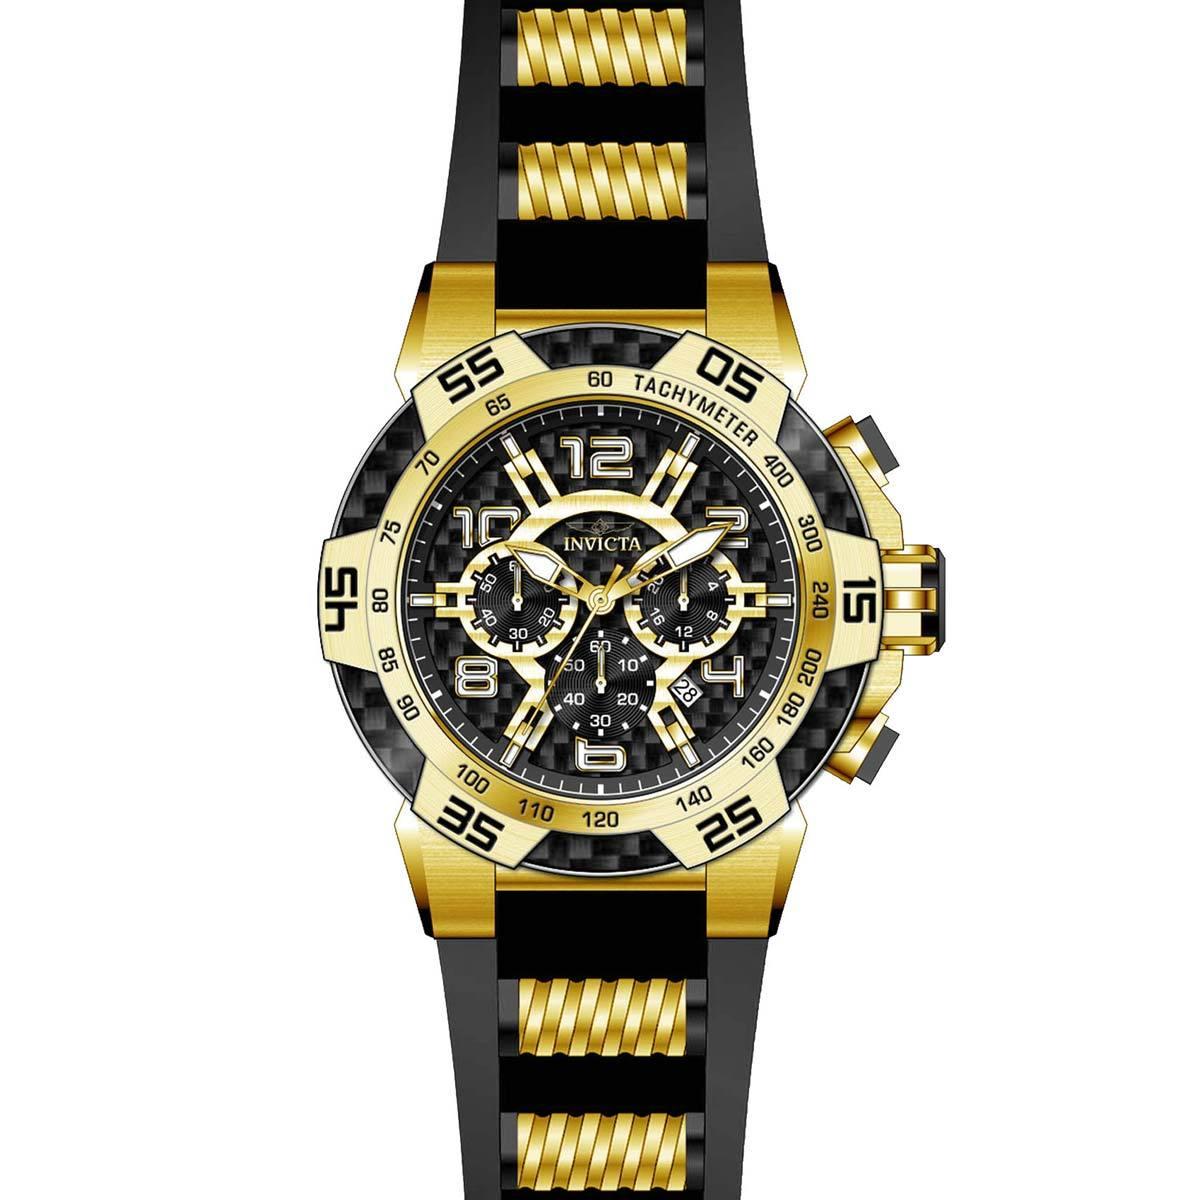 Invicta 24233 Men's Speedway Black Carbon Fiber Dial Yellow Steel & Silicone Strap Chrono Watch